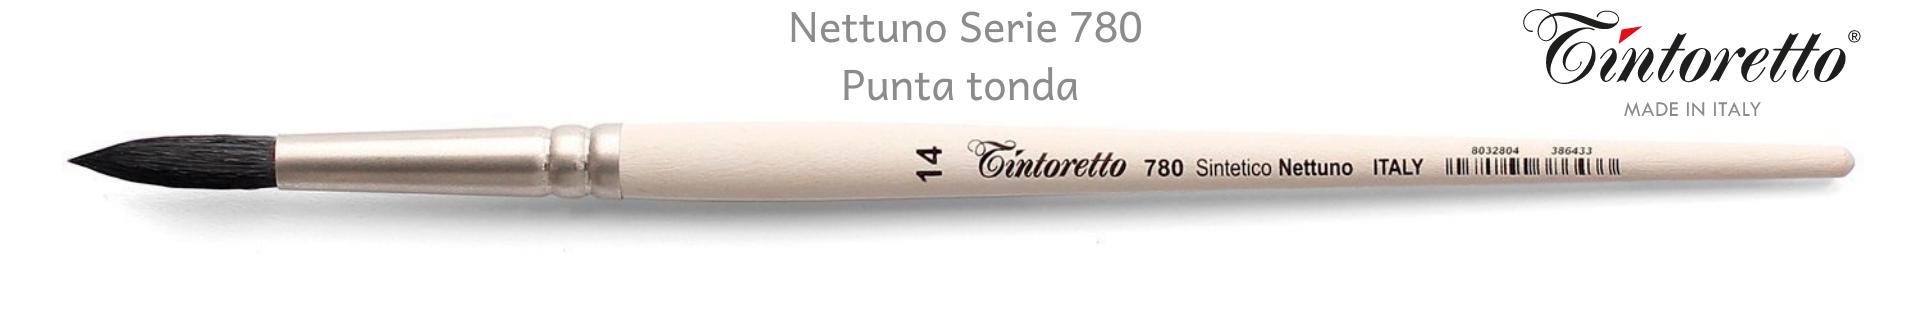 Tintoretto Nettuno 780 Tondi